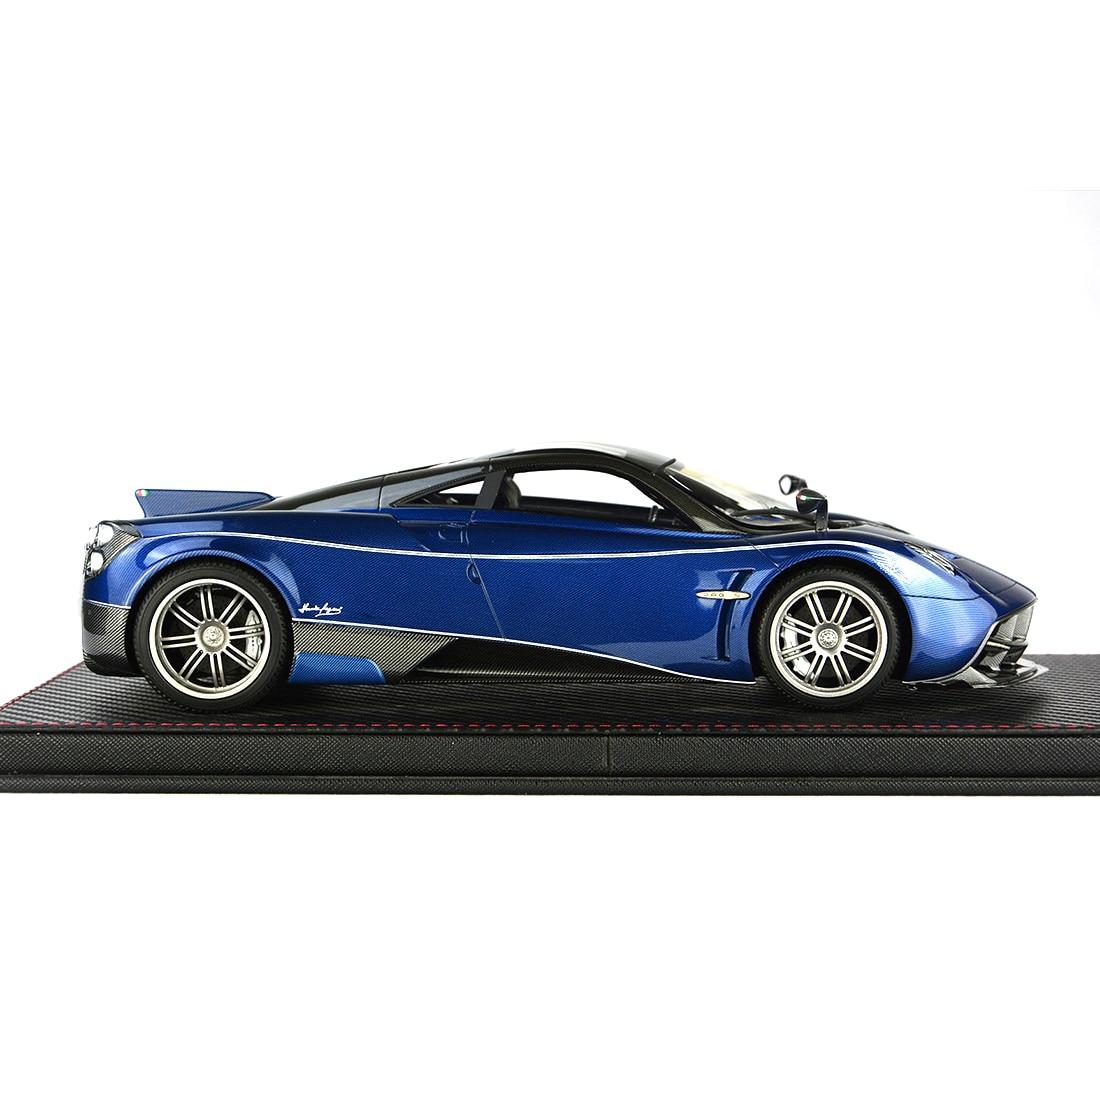 1:18 Auto Model Pagani Huayra Model Collection Decor Met Base Stofkap Model Educatief Speelgoed Blauw/Charcoal Grey /Paars Rood - 5